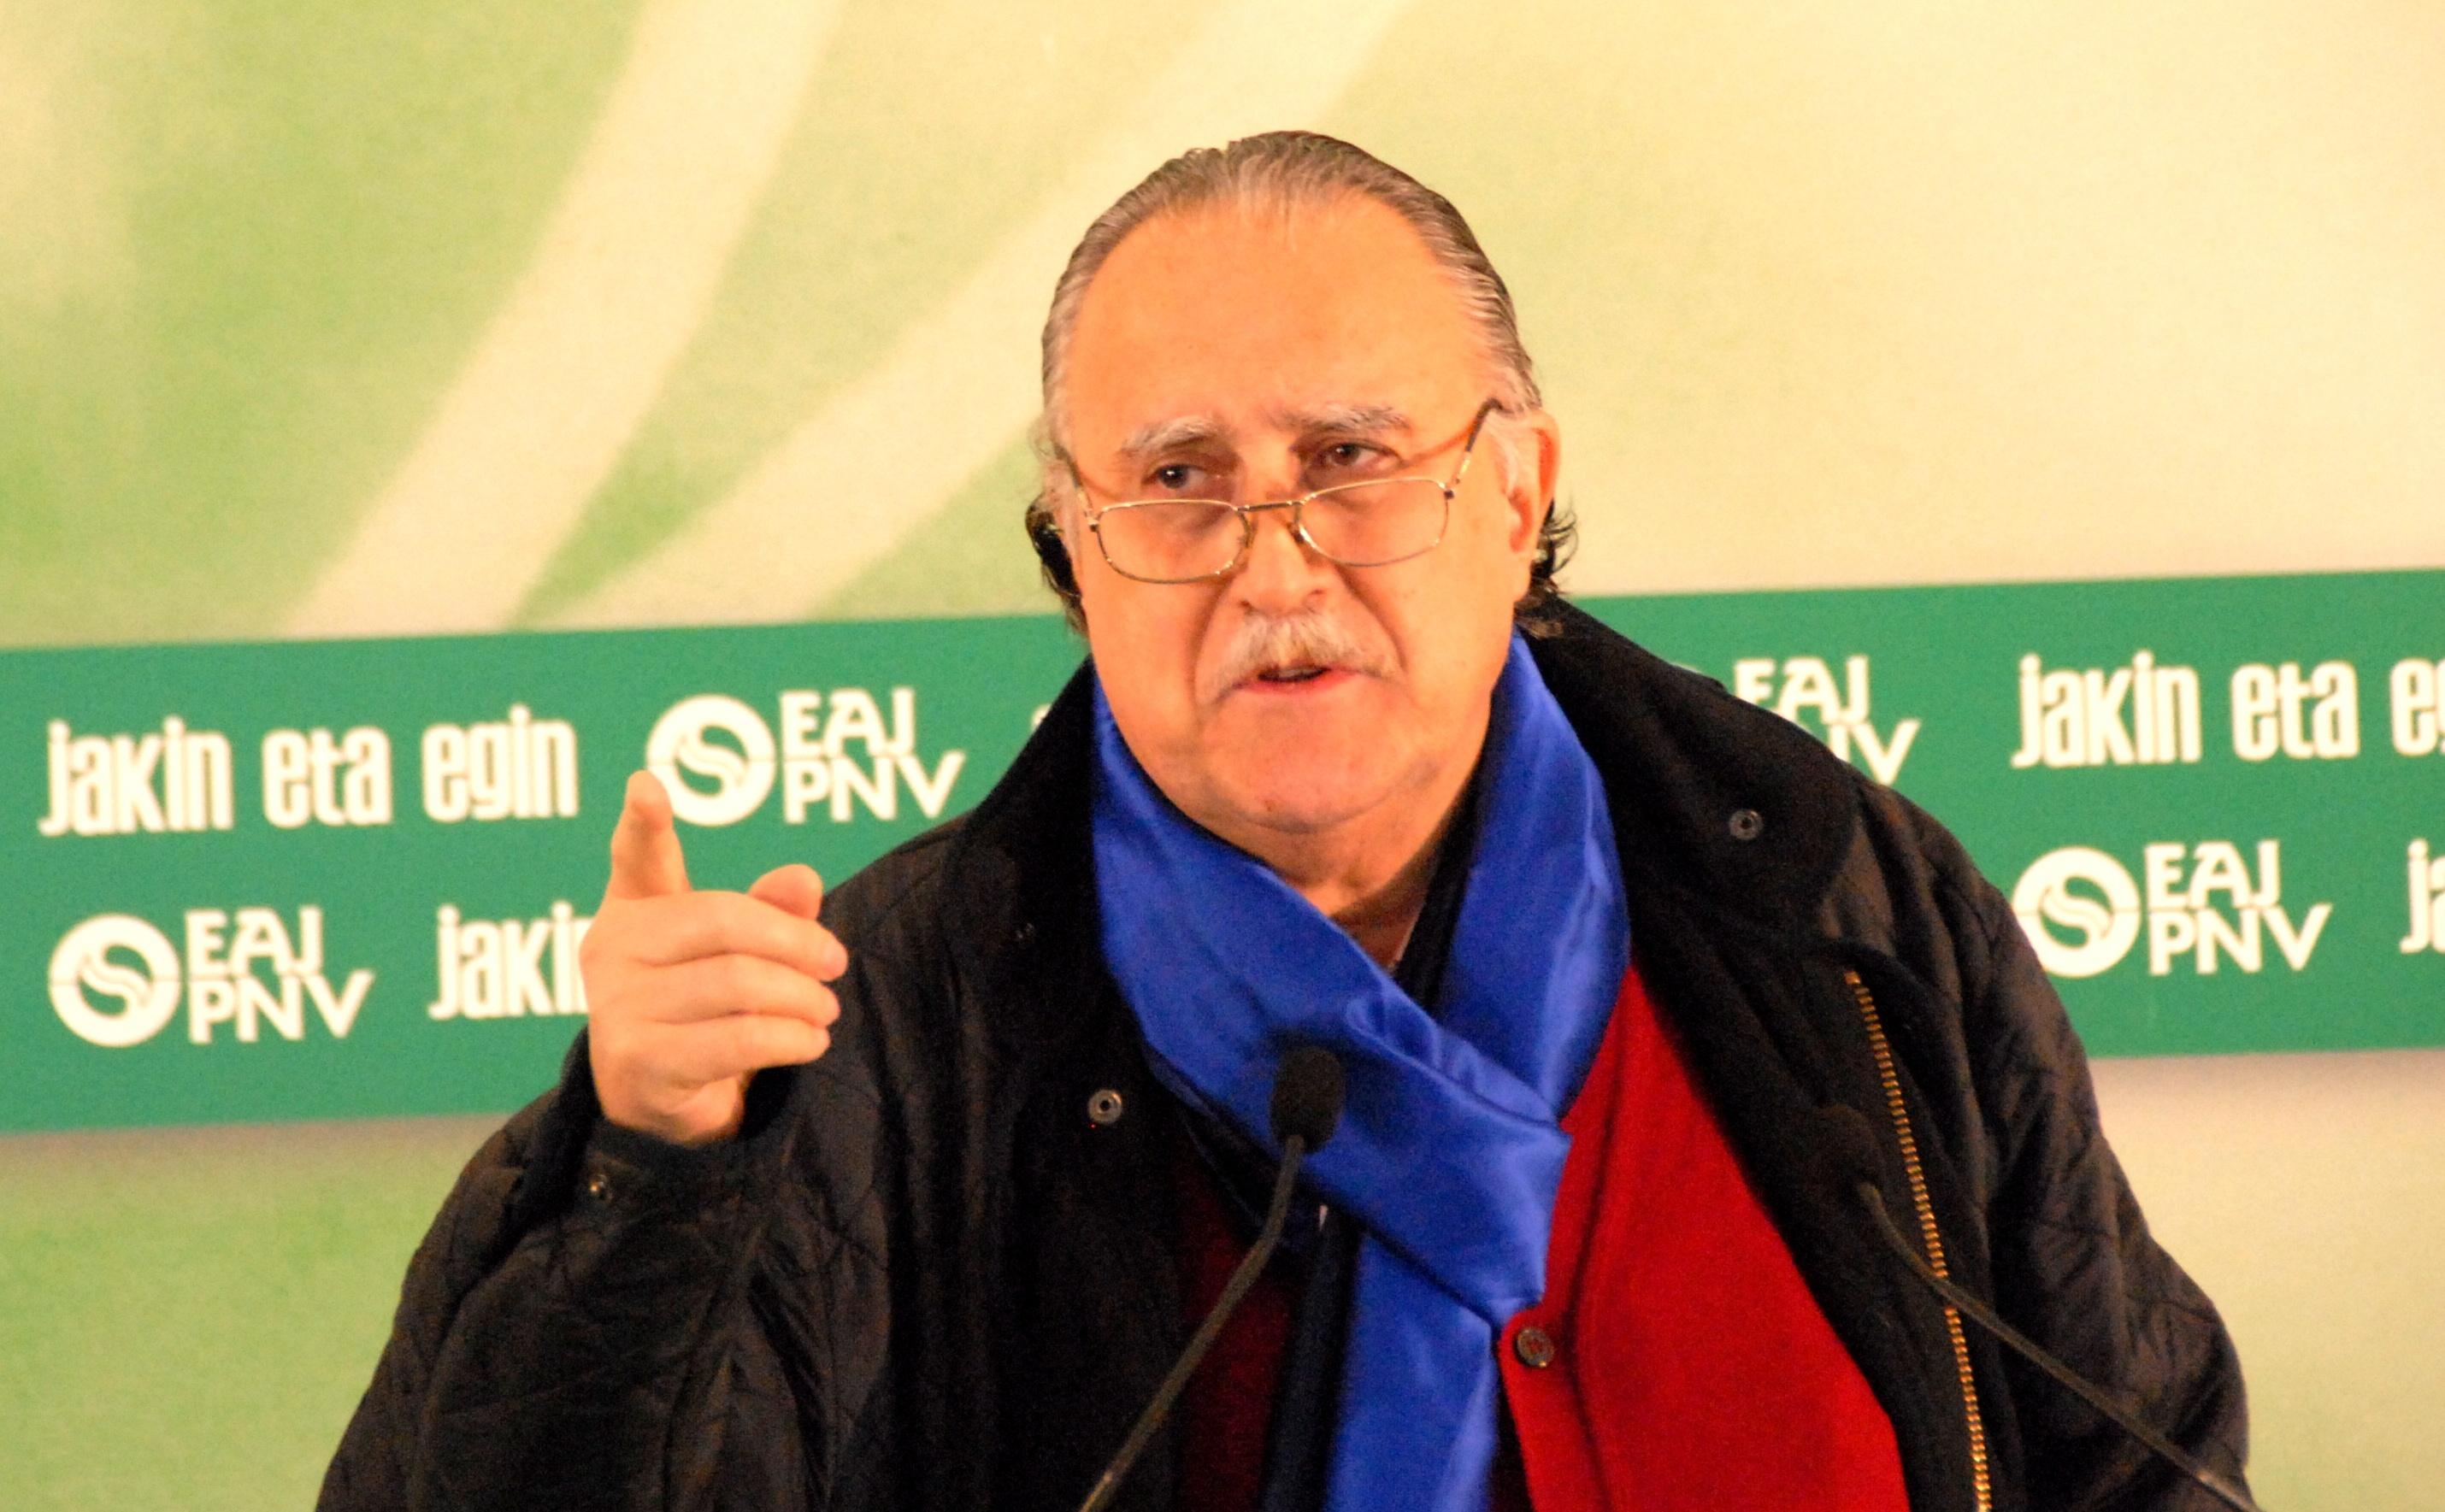 El alcalde de Bilbao evoluciona favorablemente